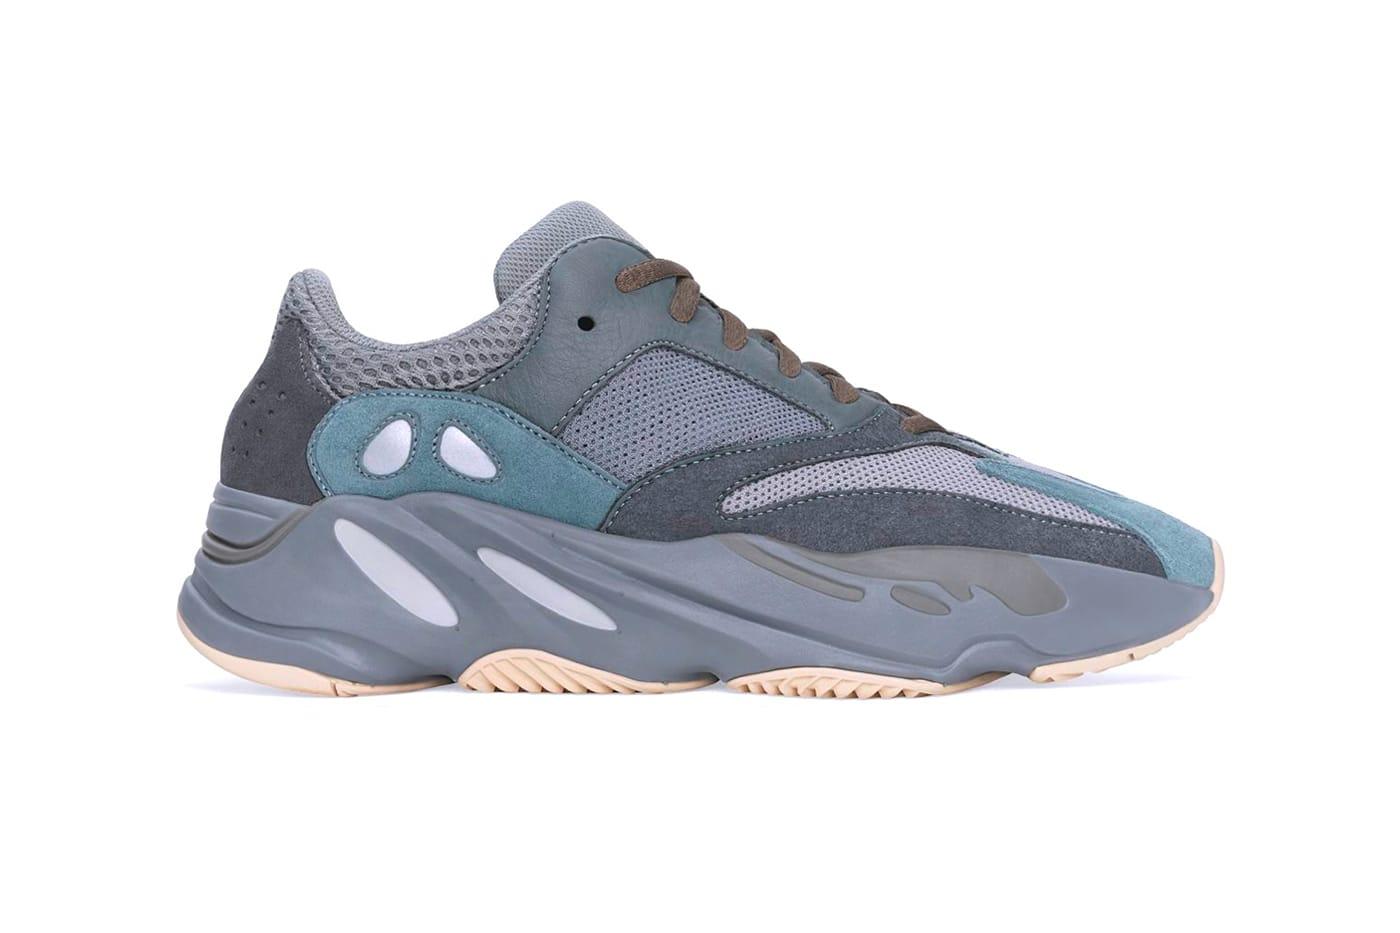 Sneaker Releases: October 2019 Week